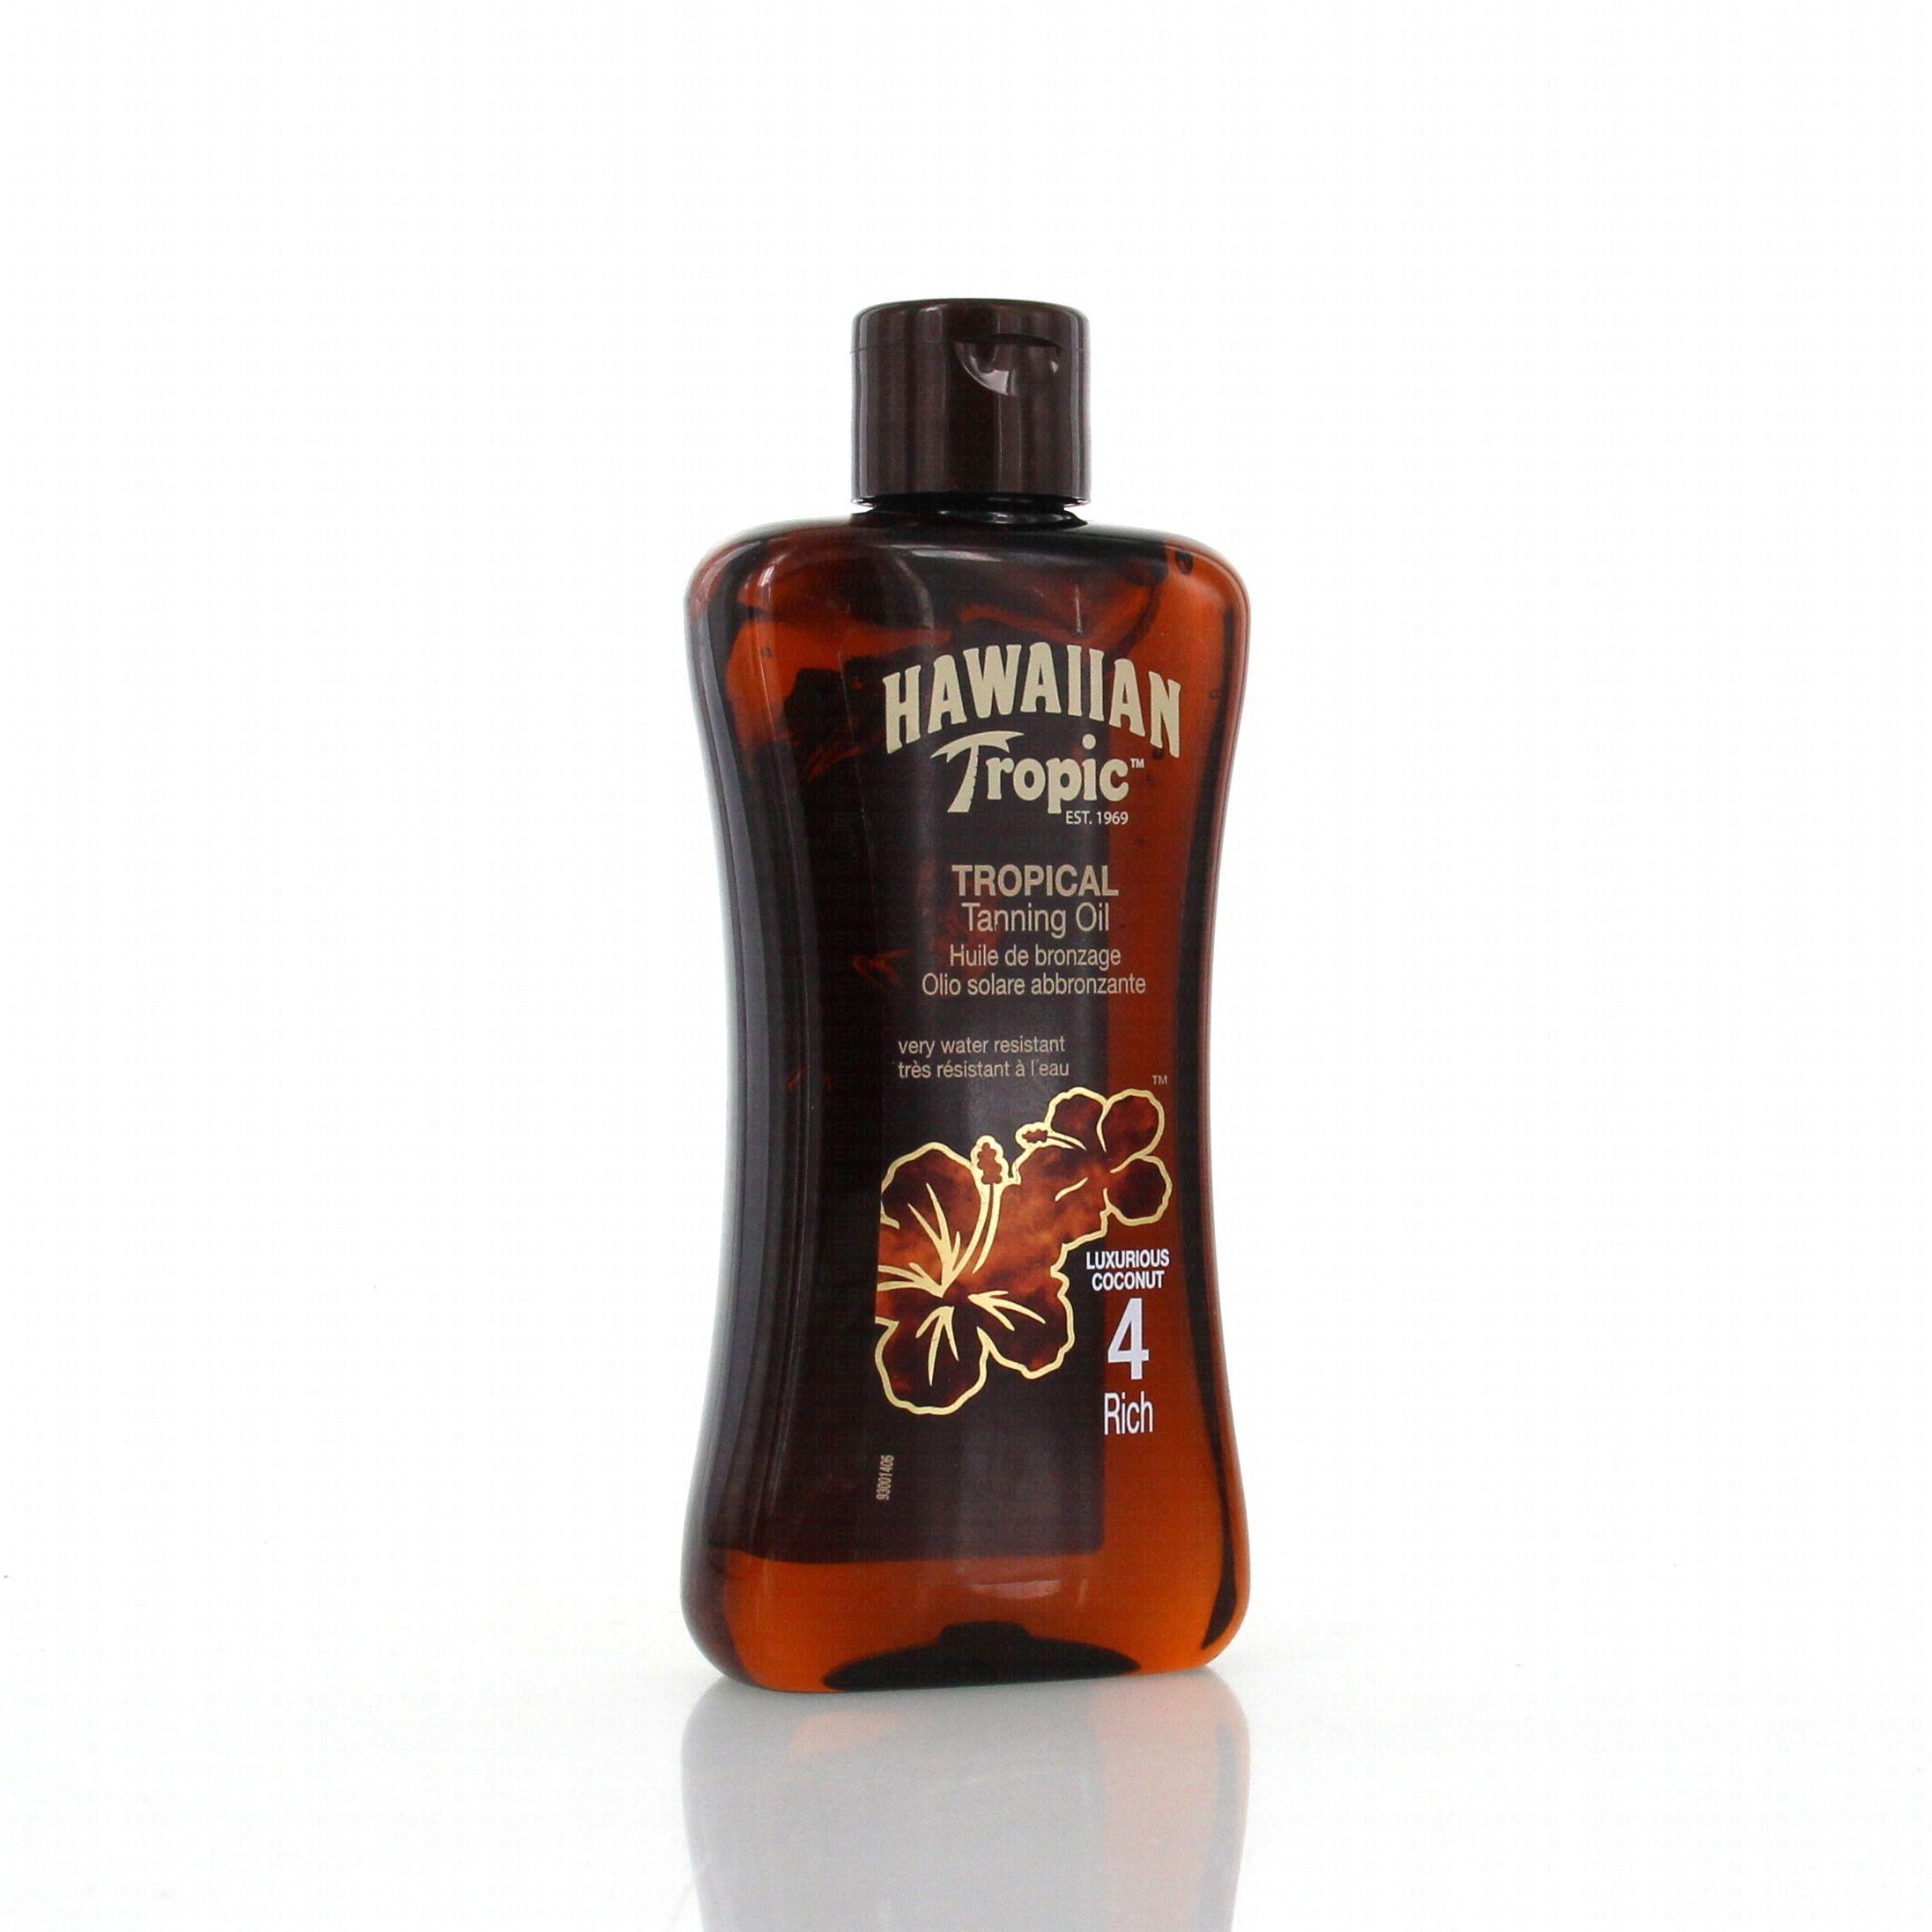 hawaiian tropic huile de bronzage spf4 flacon 200ml. Black Bedroom Furniture Sets. Home Design Ideas